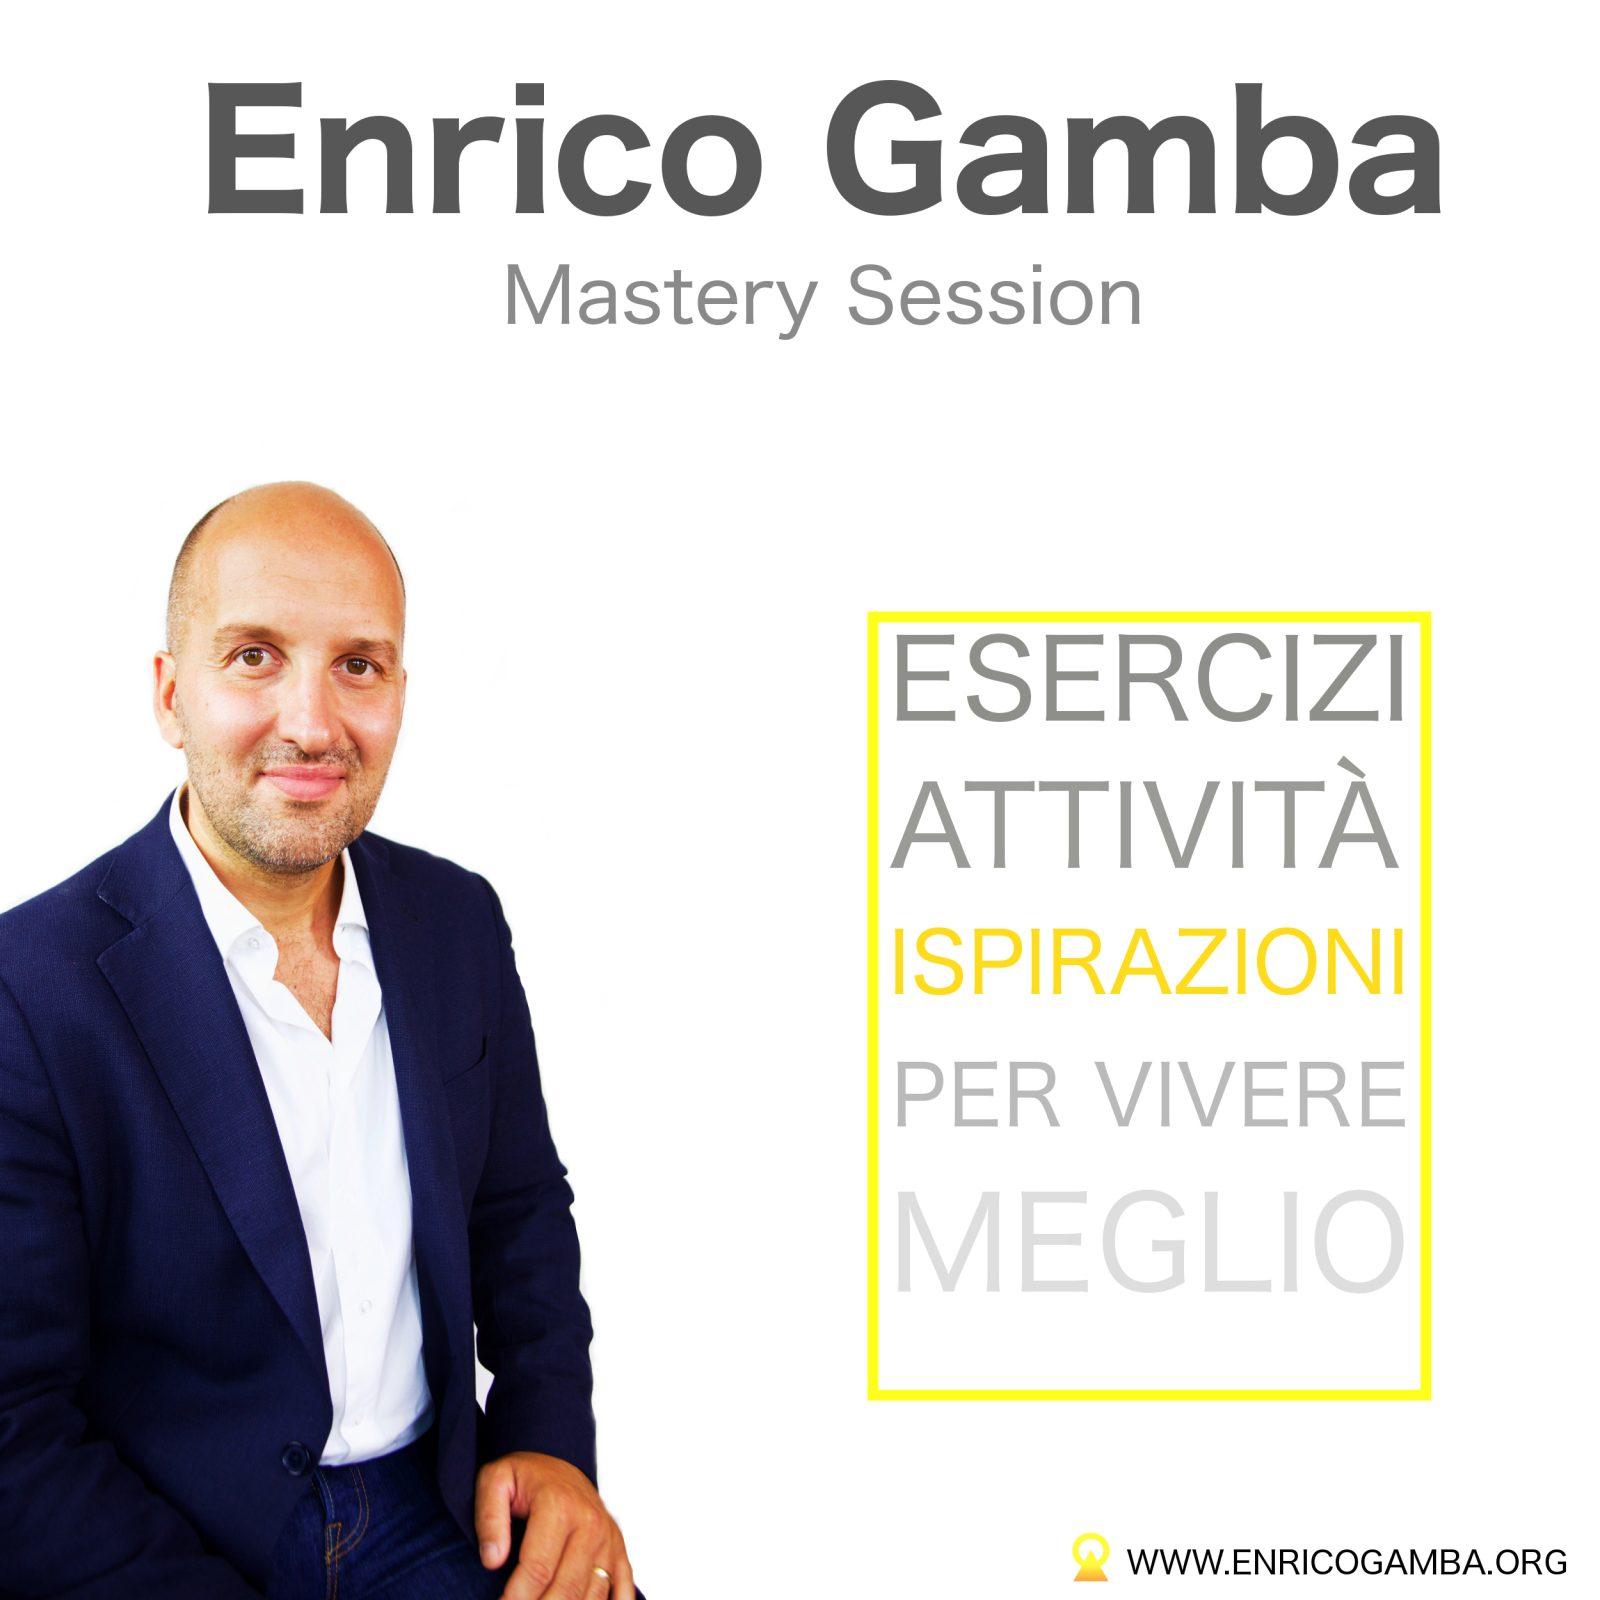 copertina-mastery-session